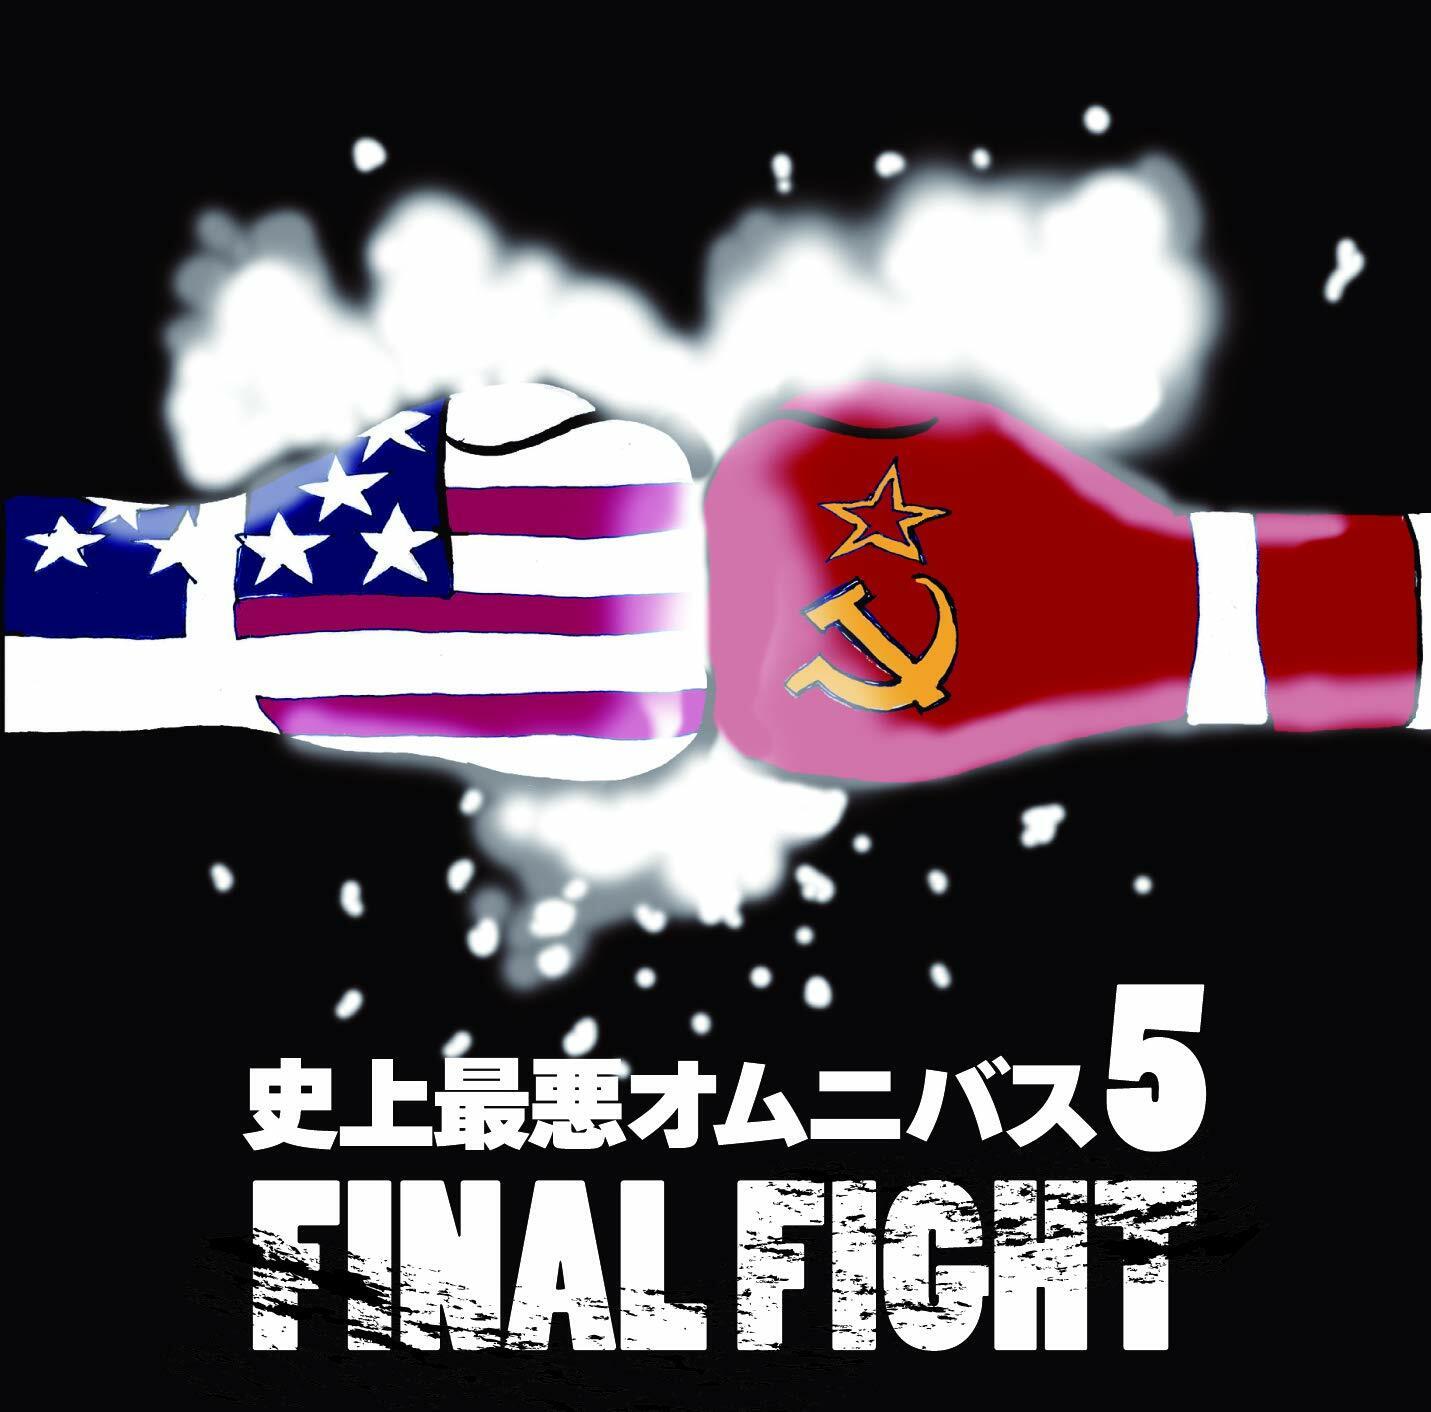 V.A. - 史上最悪オムニバス5FINAL FIGHT(Shijou Saiaku Omnibus5 FINAL FIGHT)(2CDs)